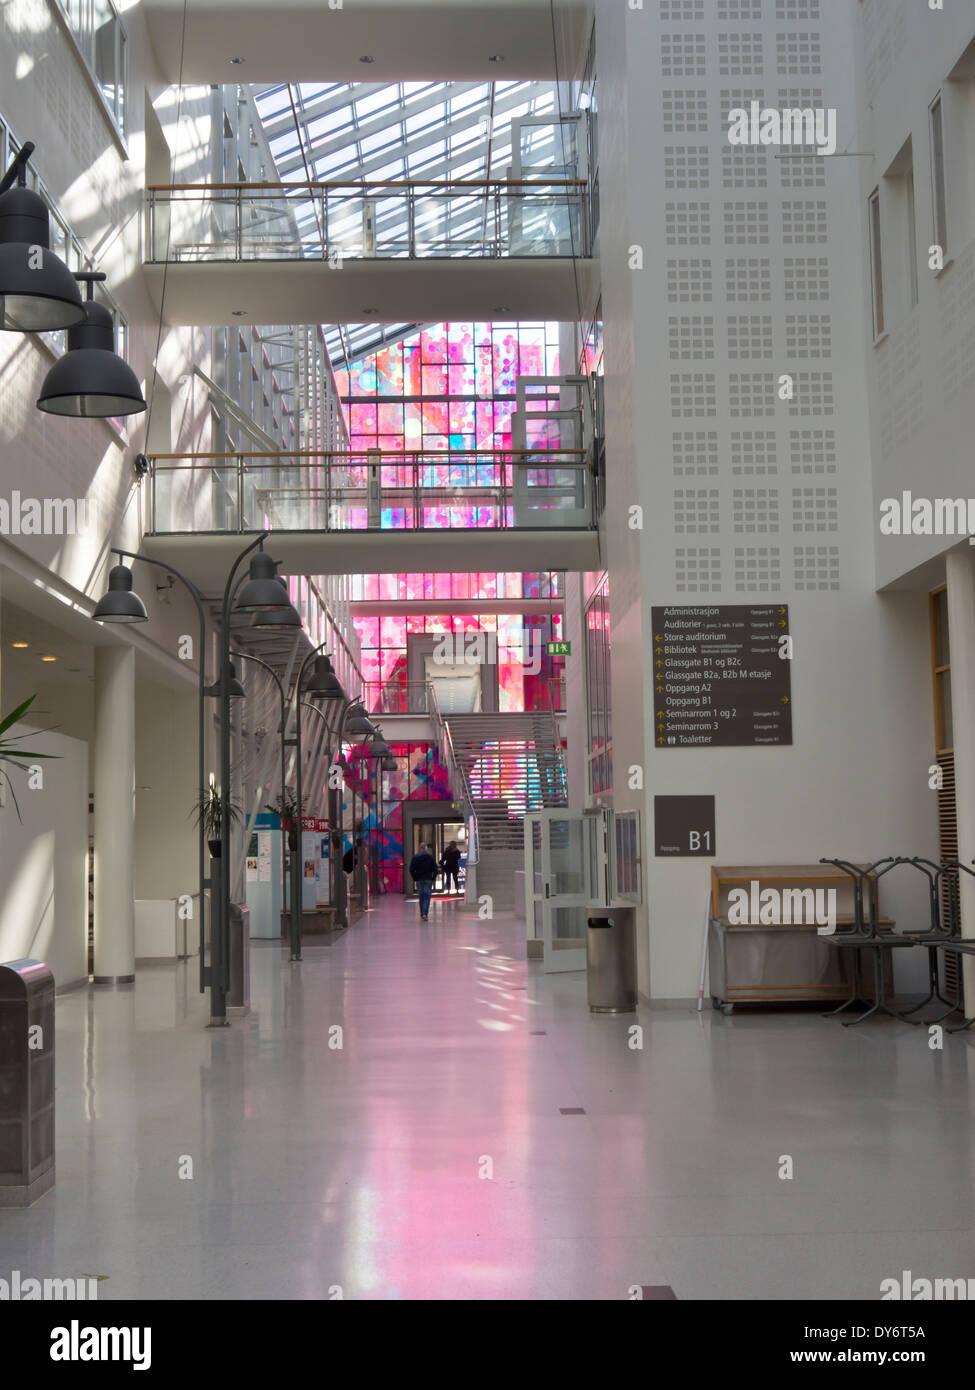 Rikshospitalet, The National Hospital, interior arrival area 'the street' , hall art and light, Oslo University Hospital Norway - Stock Image